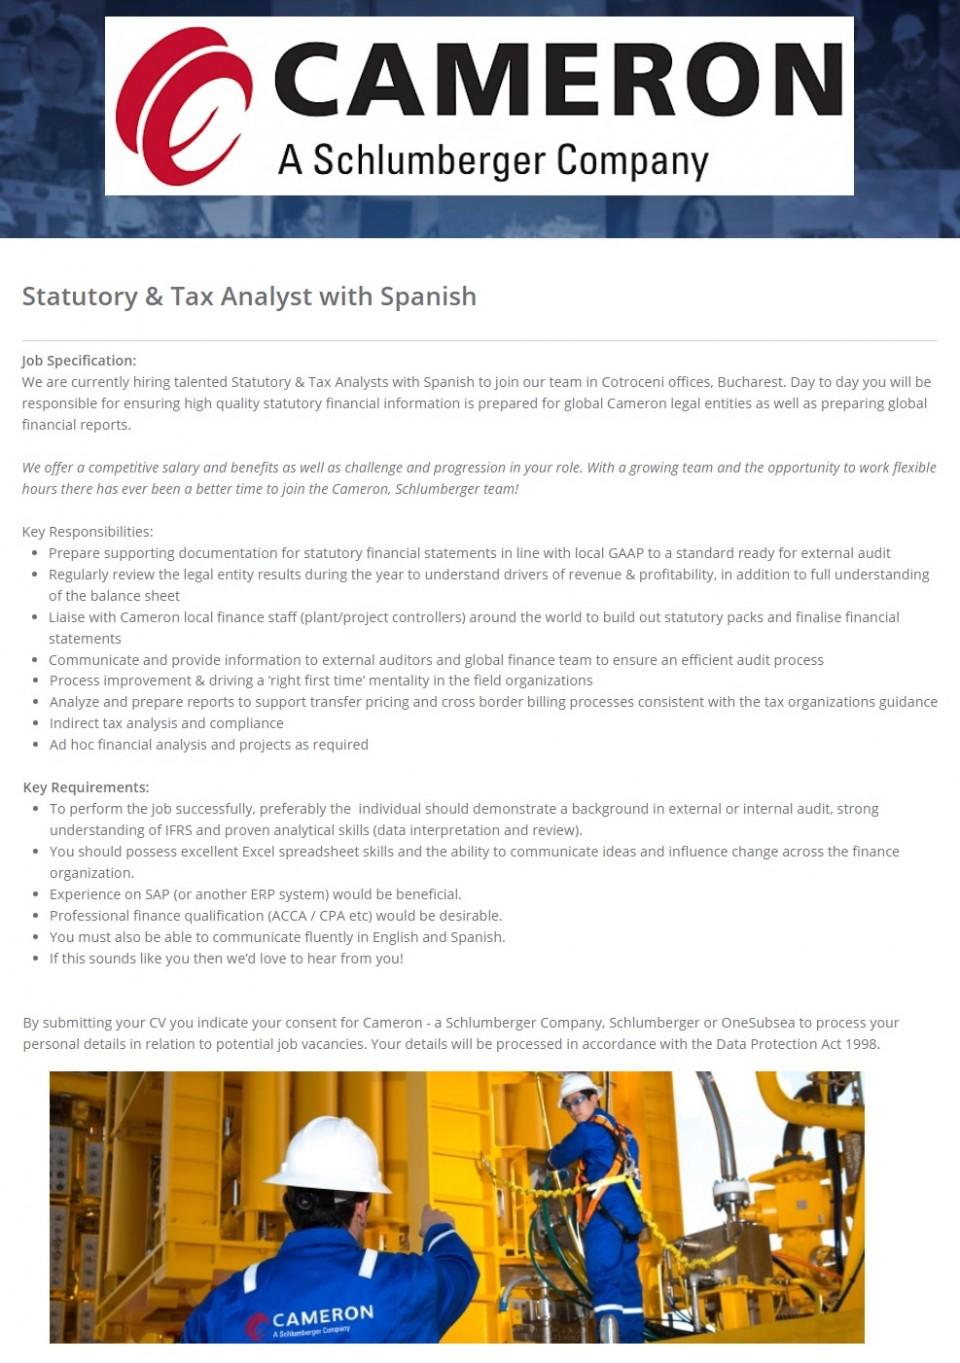 Statutory & Tax Analyst Spanish, CAMERON - Apply on eJobs!